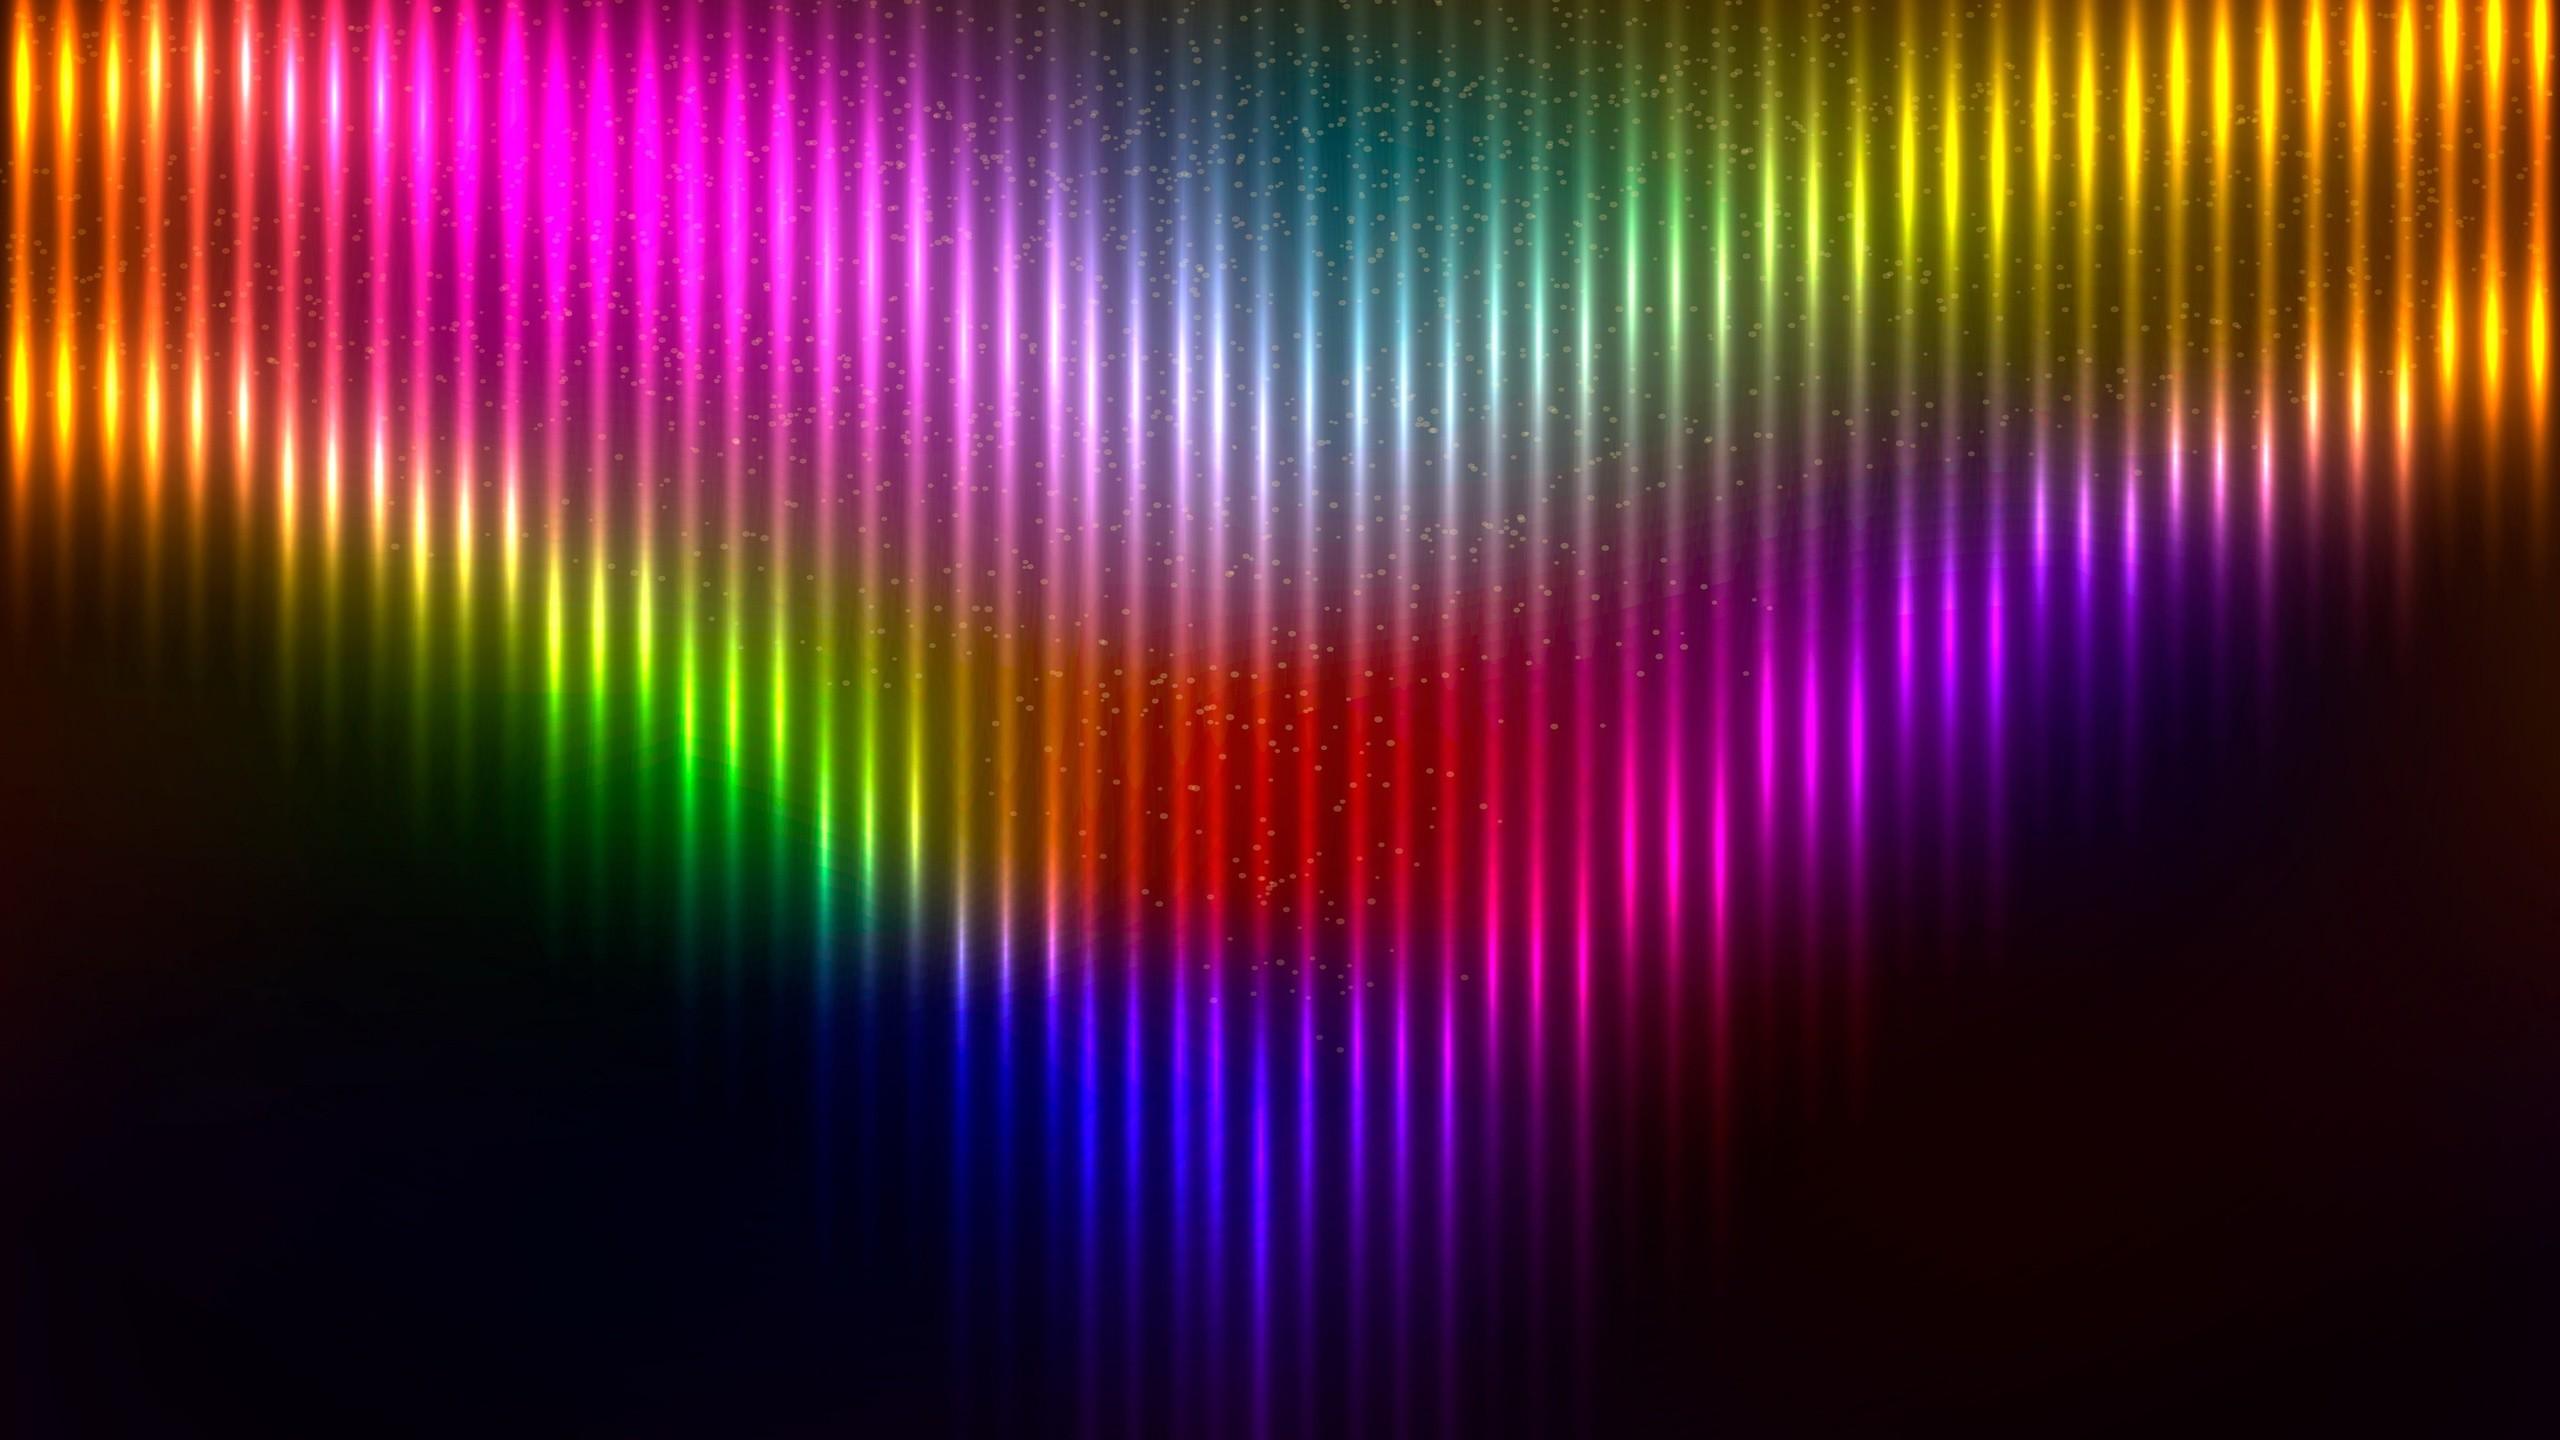 Res: 2560x1440, artistic-colors-rainbow-background-4k-z8.jpg